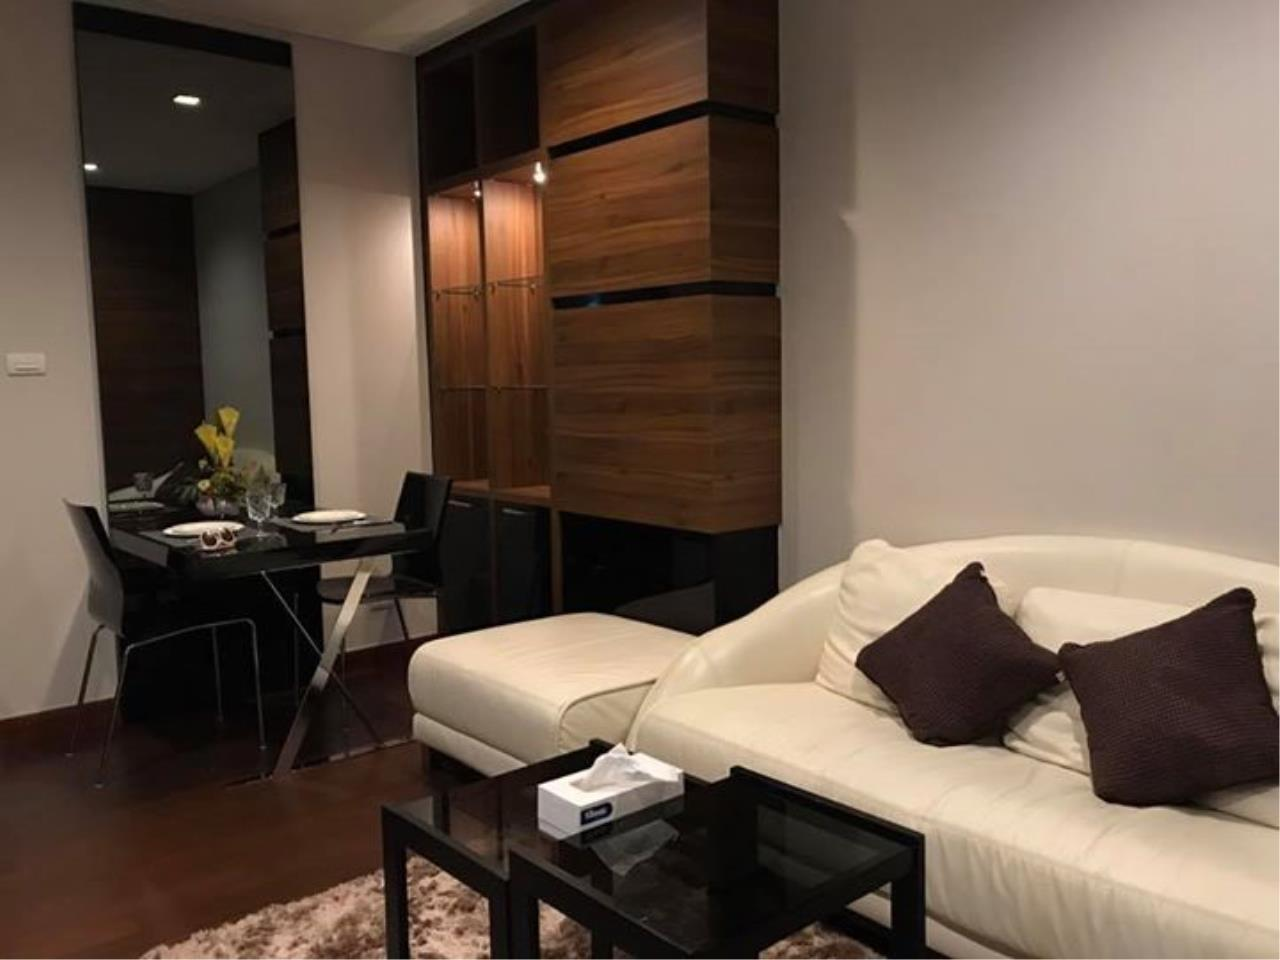 Quality Life Property Agency's S A L E & R E N T !! [ IVY THONGLOR ] Studio 35.63 Sq.m. New Decoration !! 3